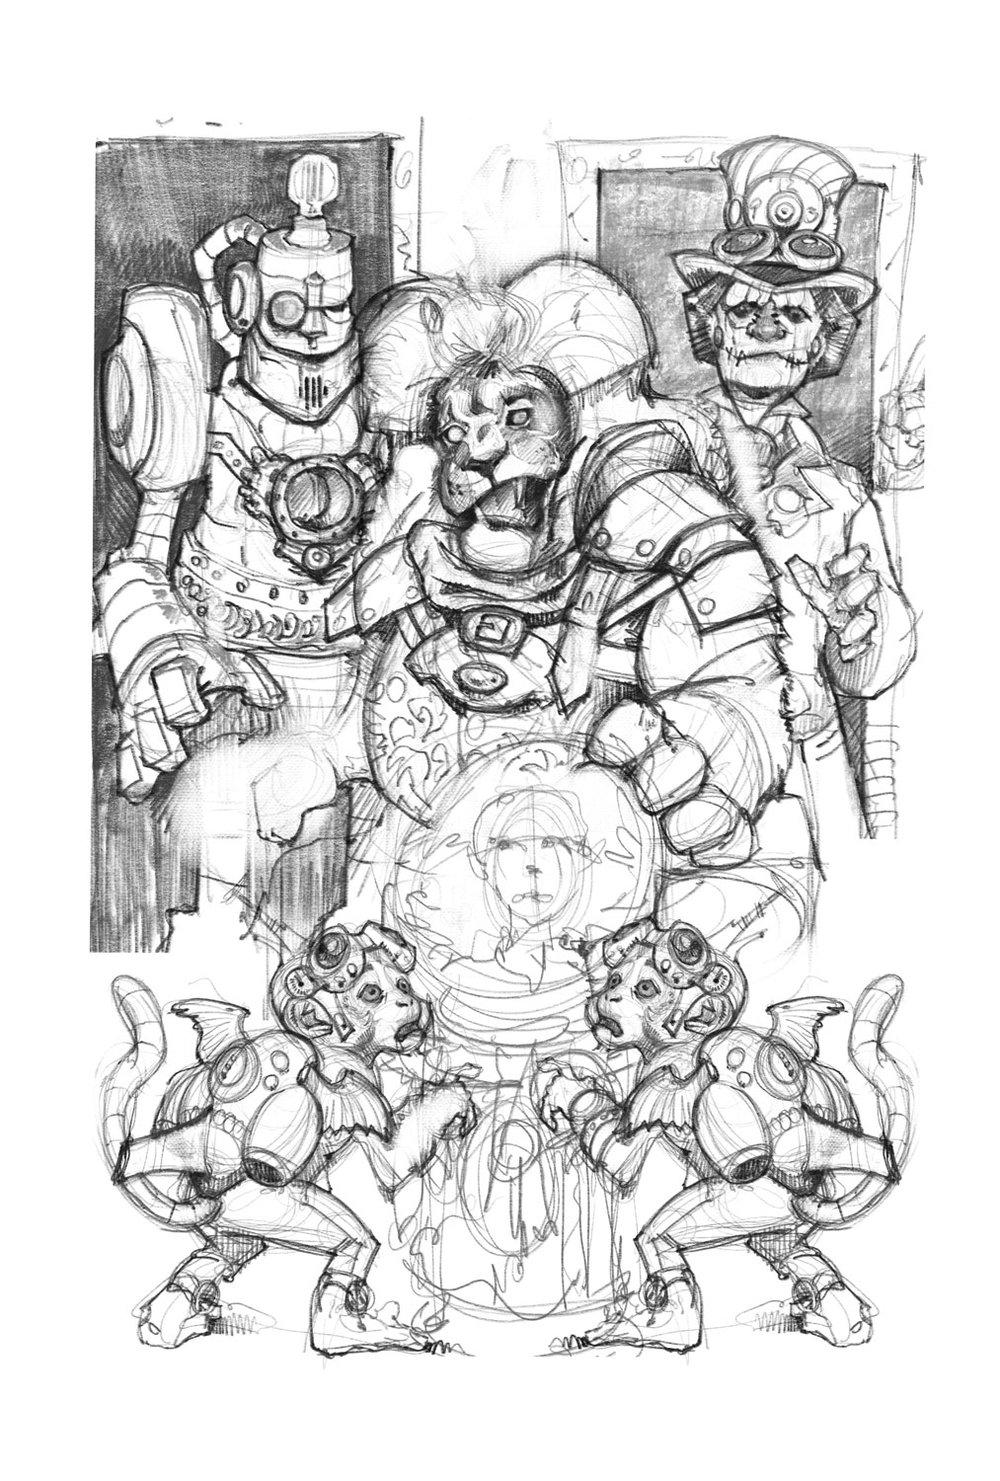 Oz_Sketch.jpg